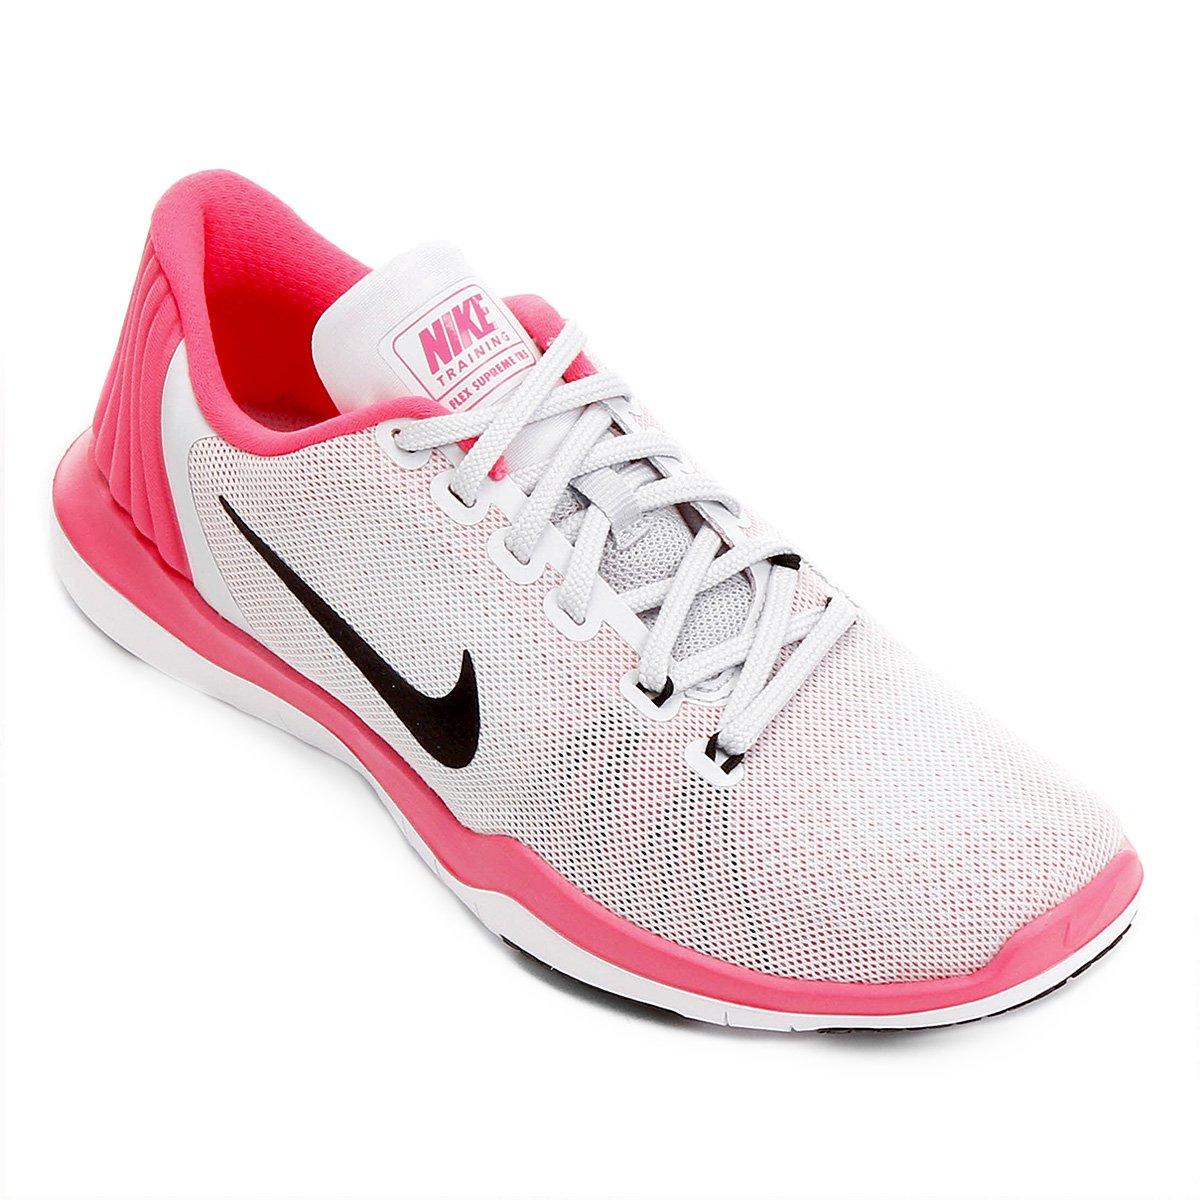 Tênis Nike Flex Supreme TR 5 Feminino - Branco e Rosa - Compre Agora ... a42aa6985ee75